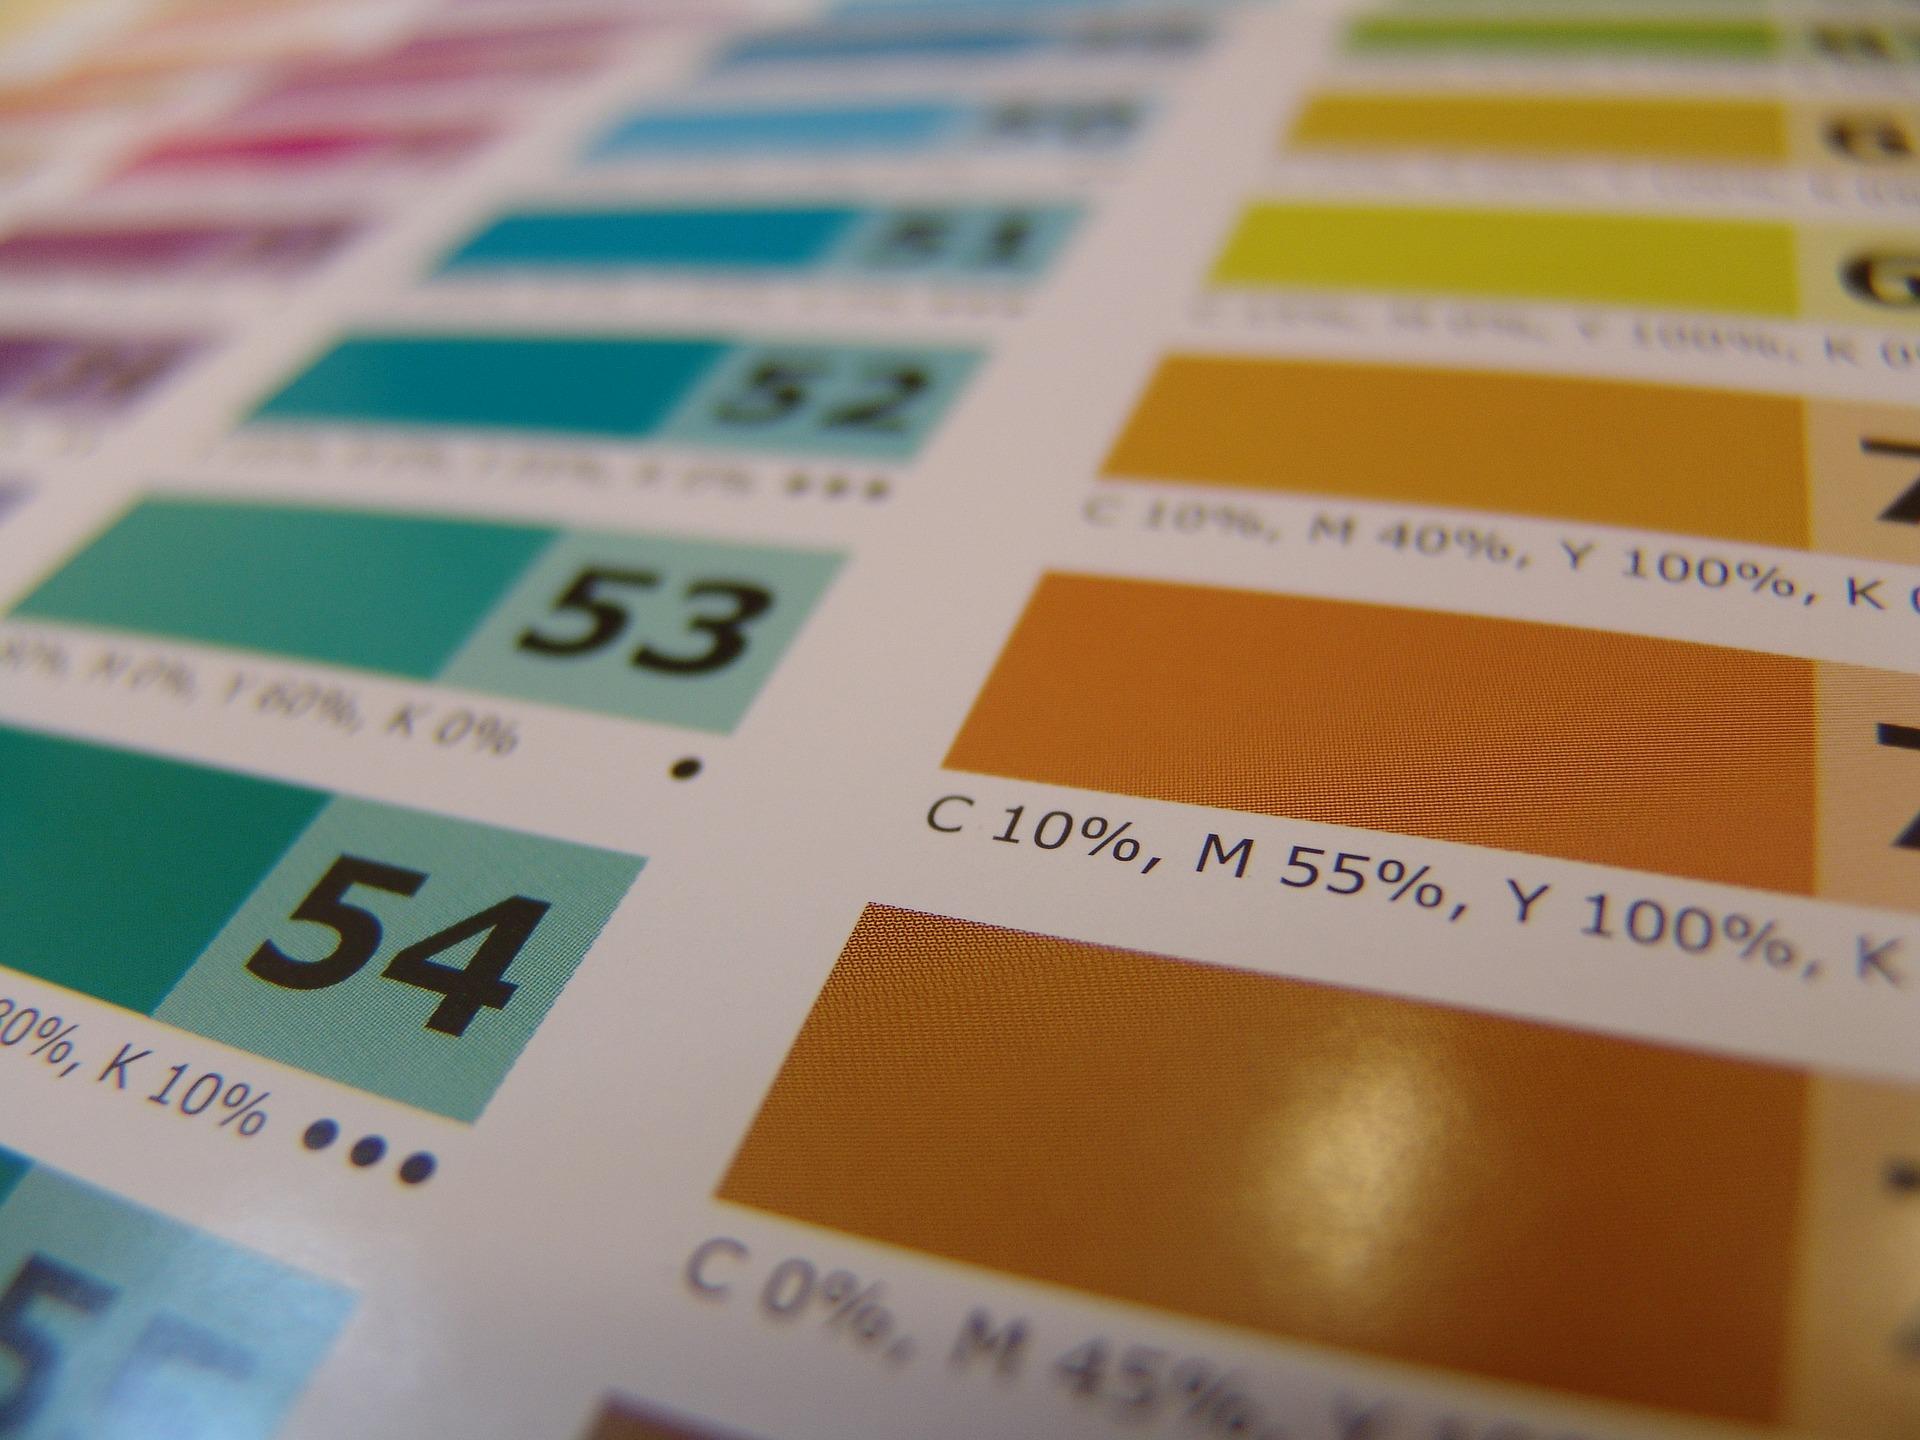 color-fan-15361_1920